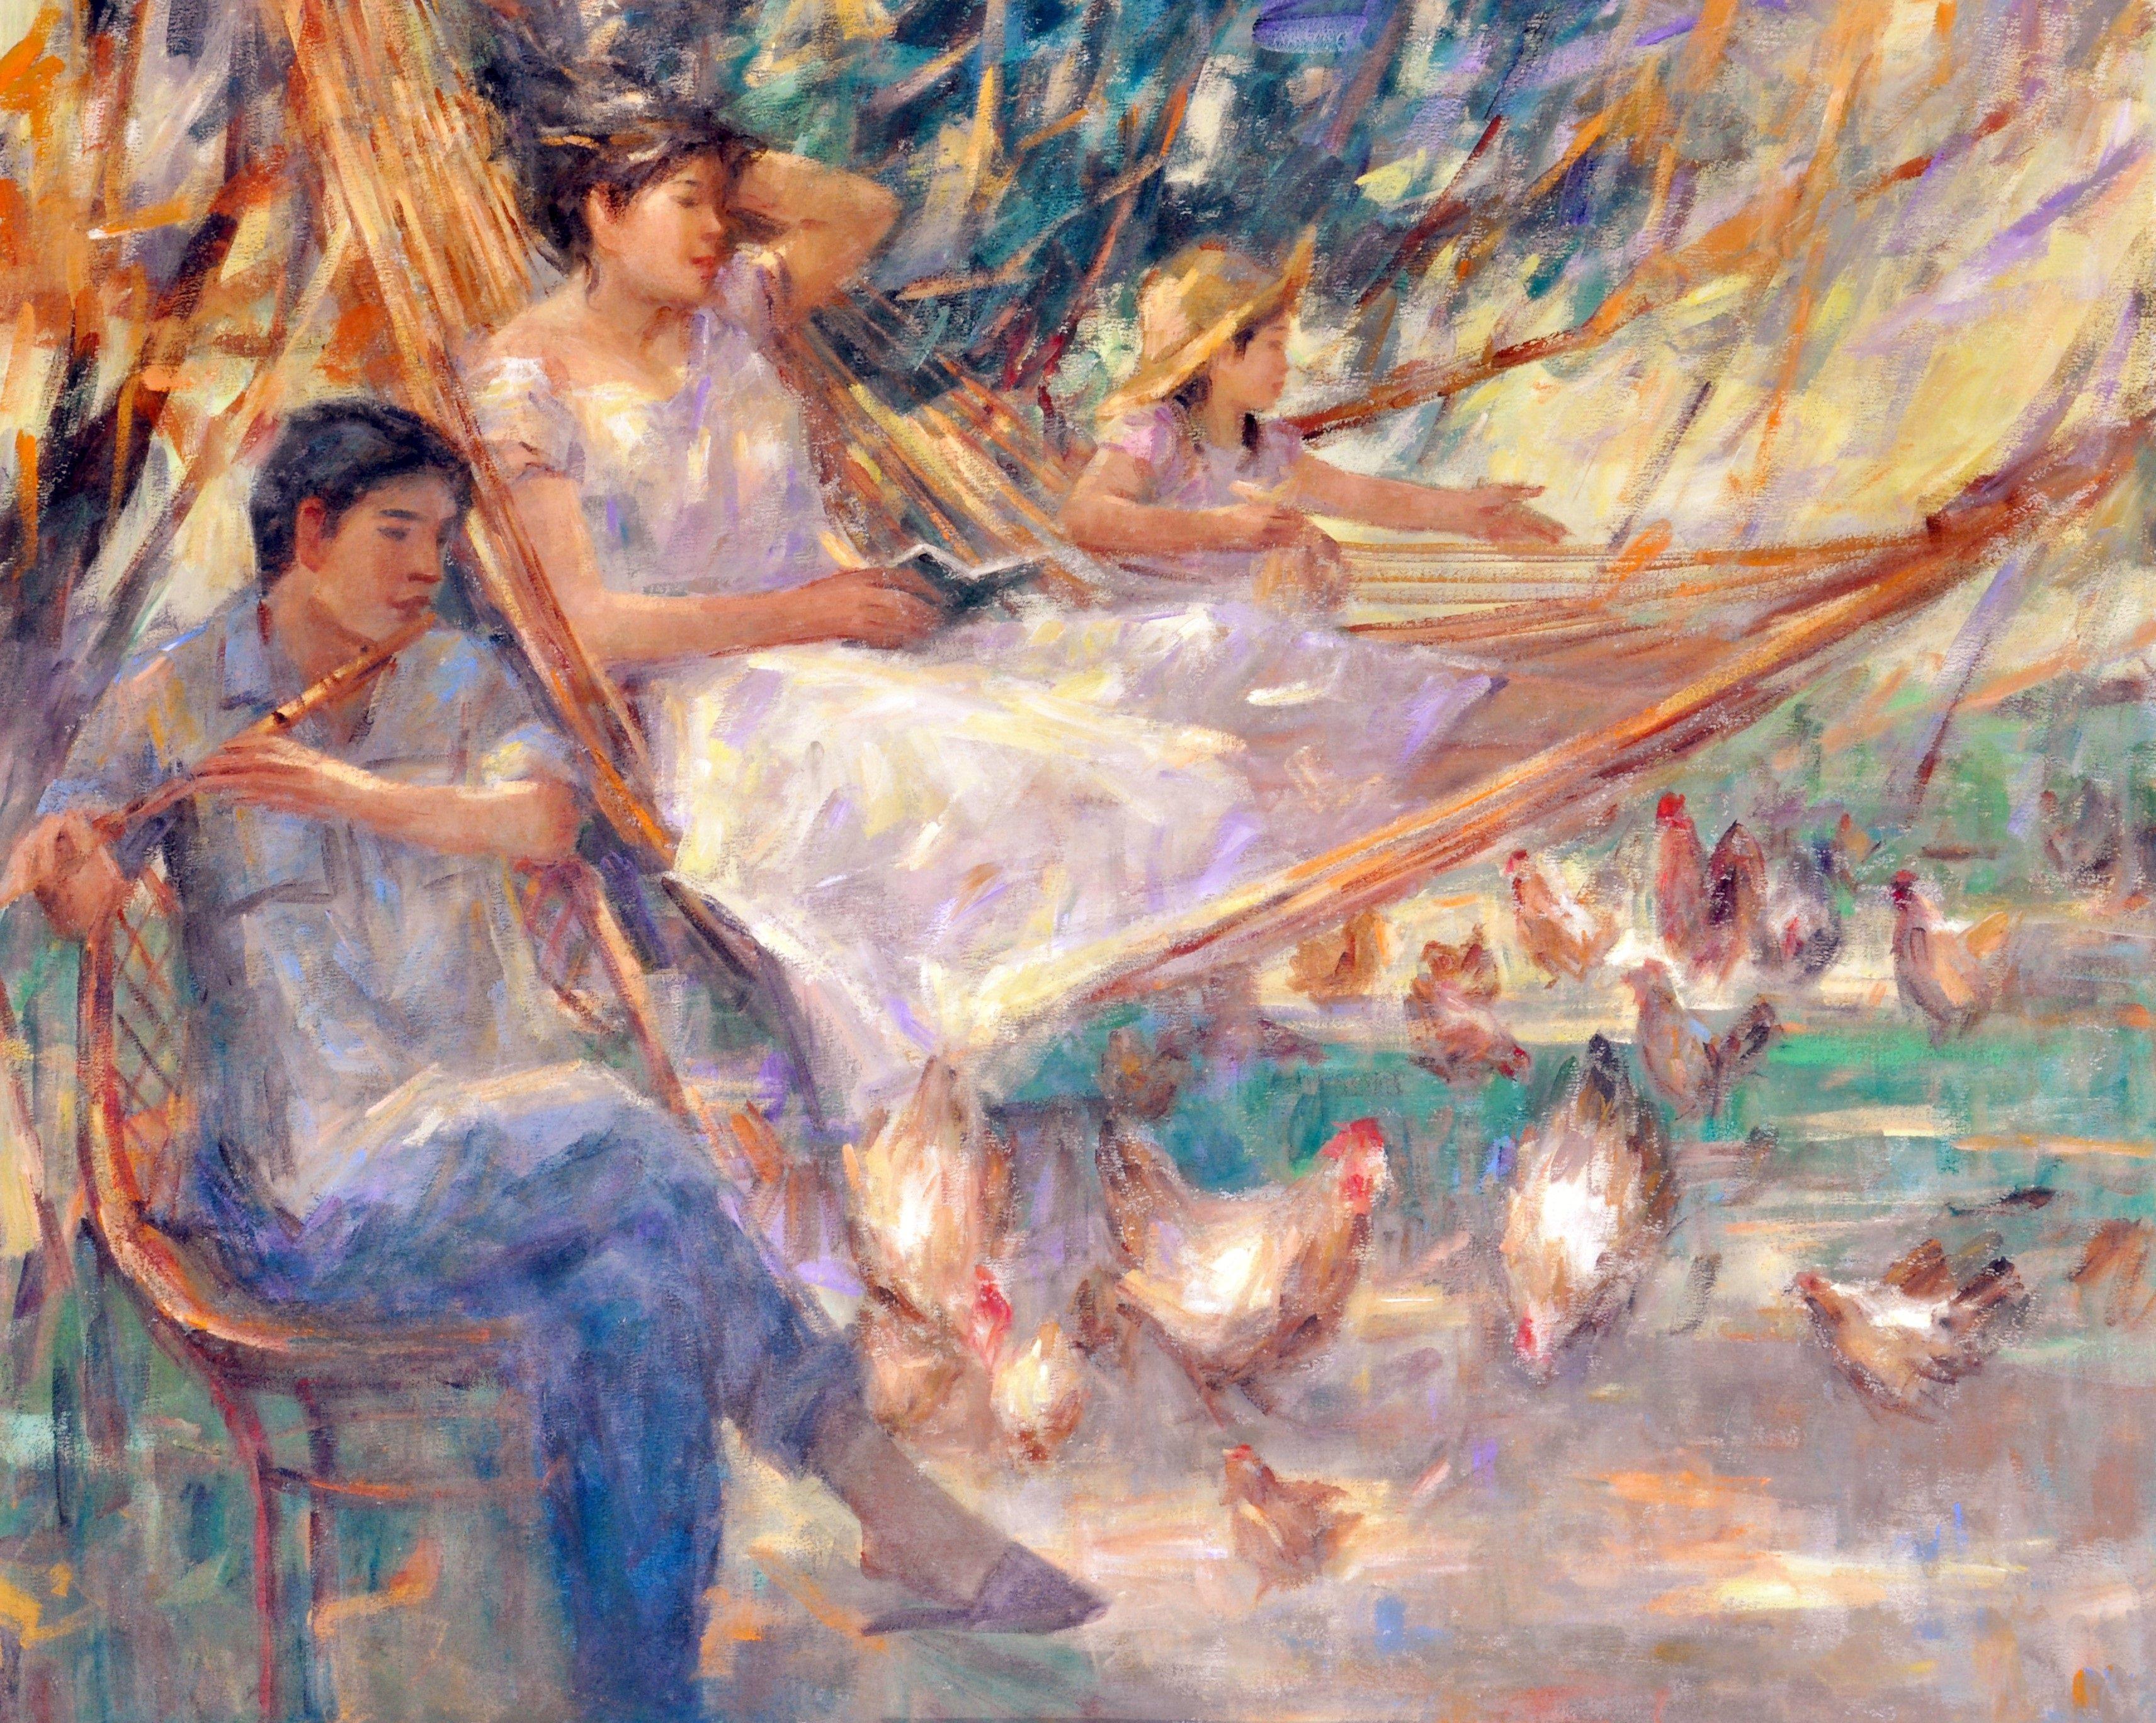 Top Ten In Philippines Artist Jun Martinez Renowned Globally For His Fine Art Masterpieces Artist Com Filipino Art Philippine Art Art